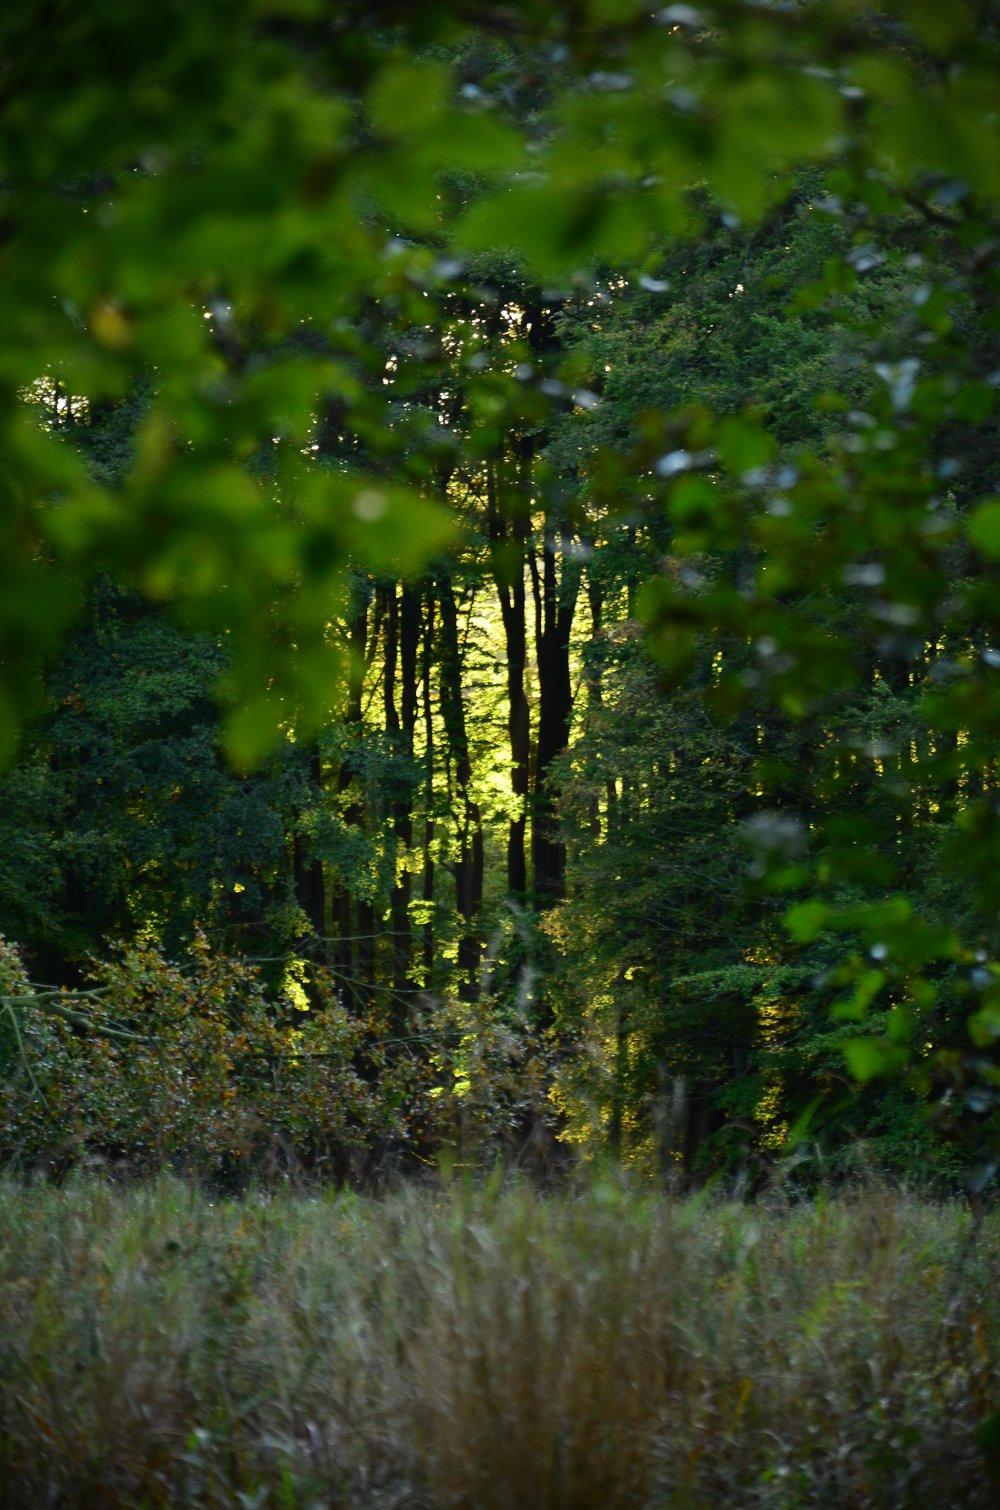 Bergwaldprojekt_Sassnitz_Ruegen_Moor_150dpi_20171014_Credits_CC-BY-SA_Jenni_Ottilie_Keppler-73.jpg